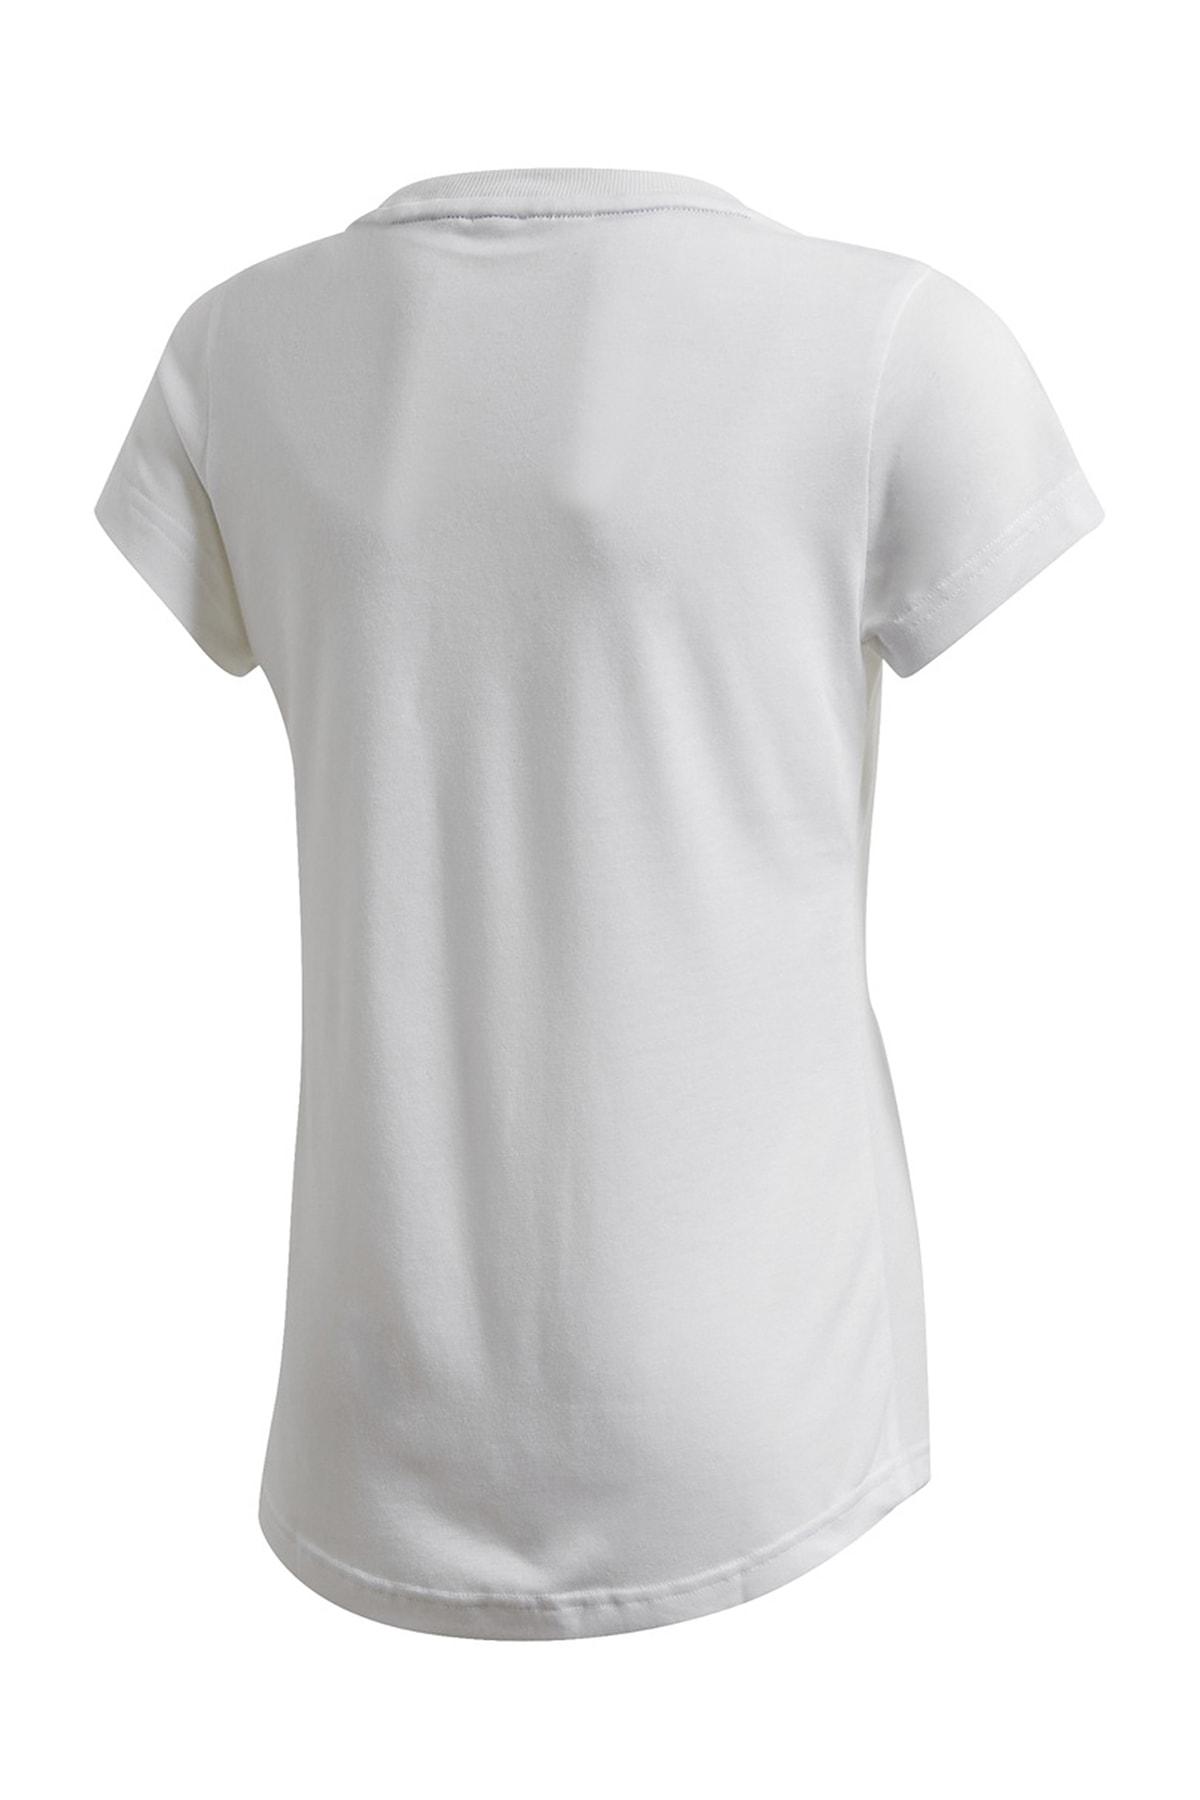 adidas Çocuk Beyaz T-Shirt 2